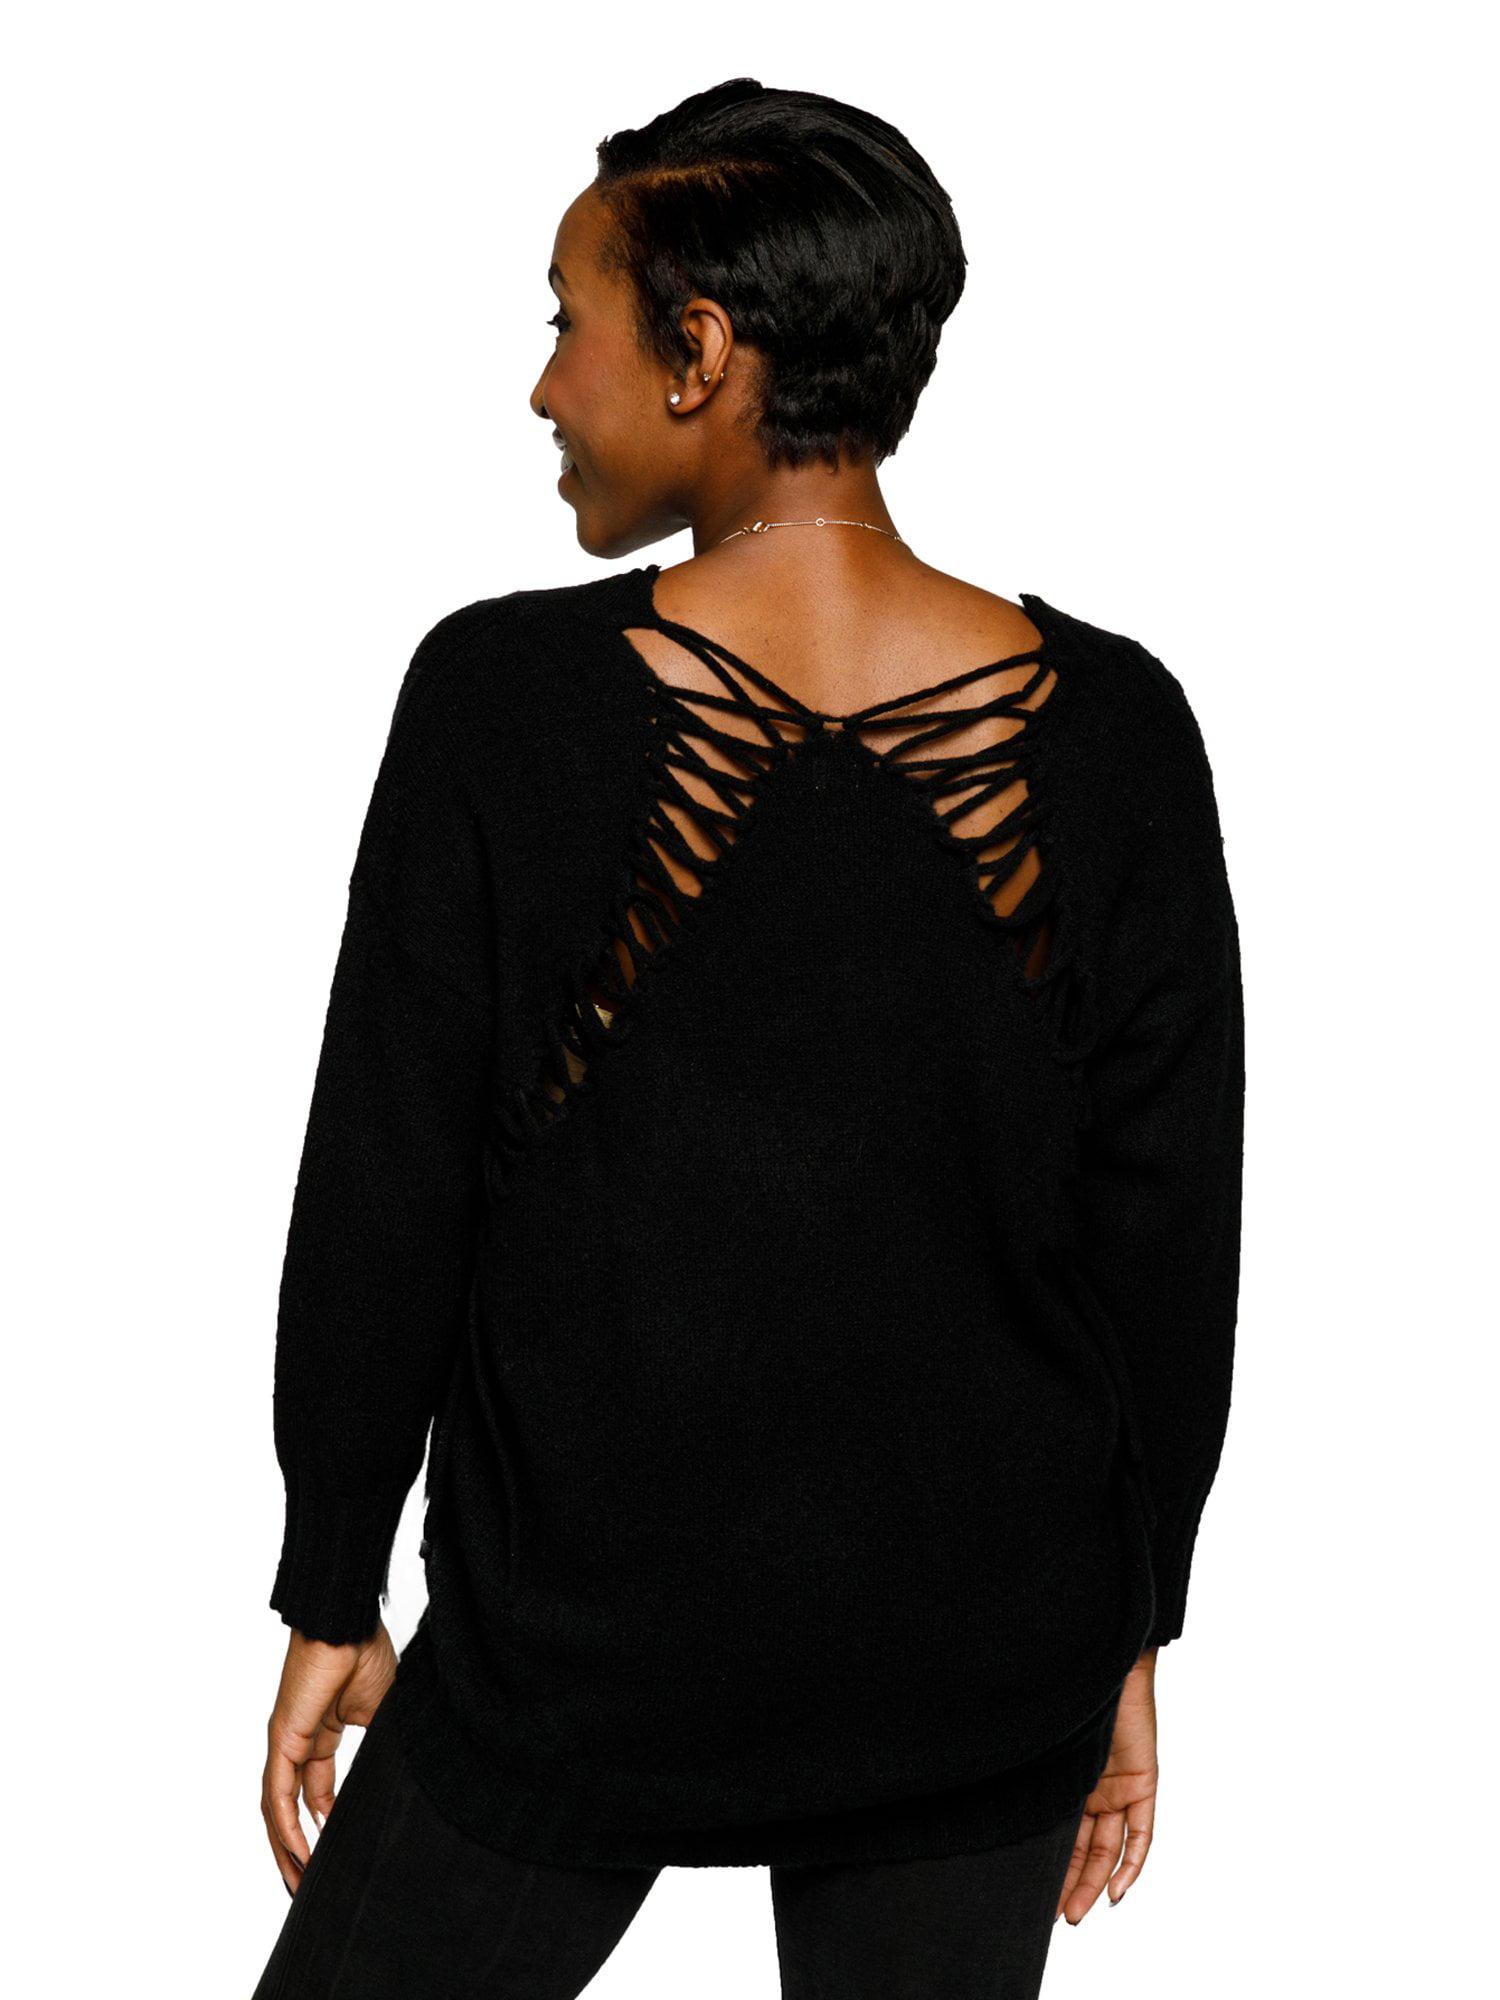 1915256d17 Xehar Women s Stylish V-Neck Pullover Lace Up Back Knit Sweater ...